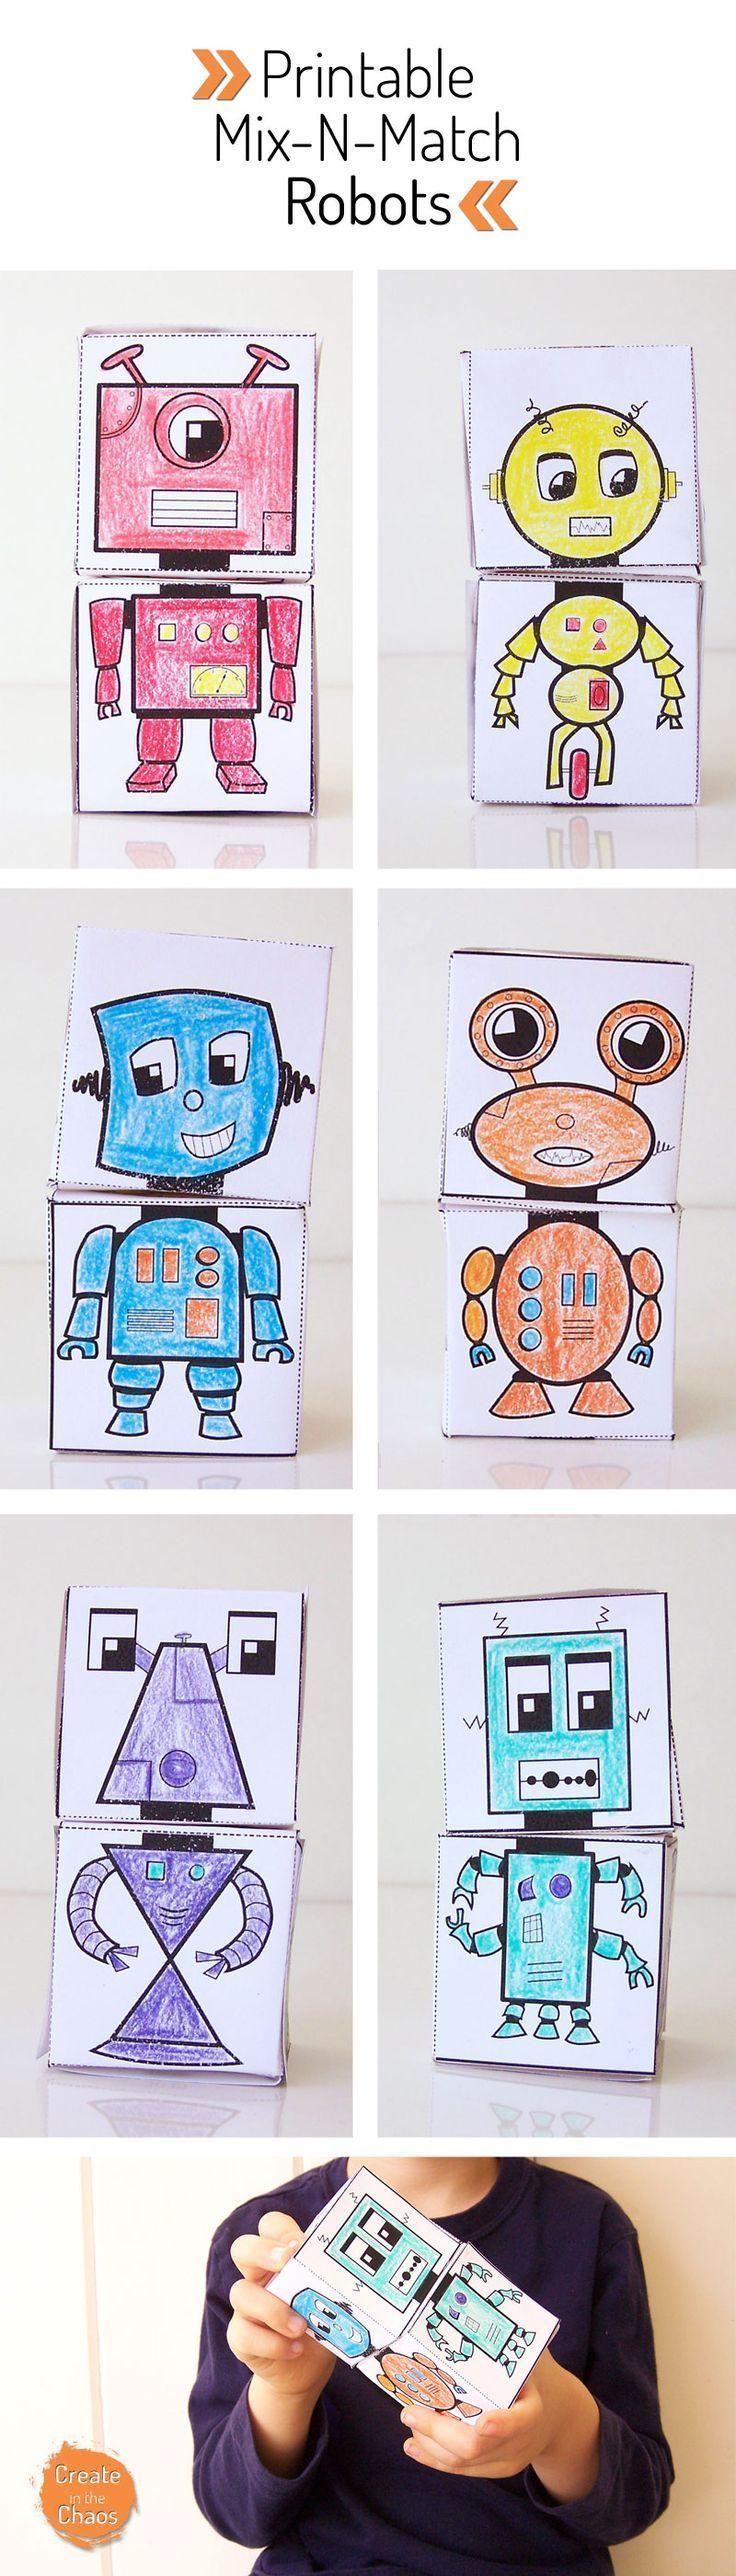 Free printable mix-n-match robot blocks - fun and easy kids craft! www.createinthech...